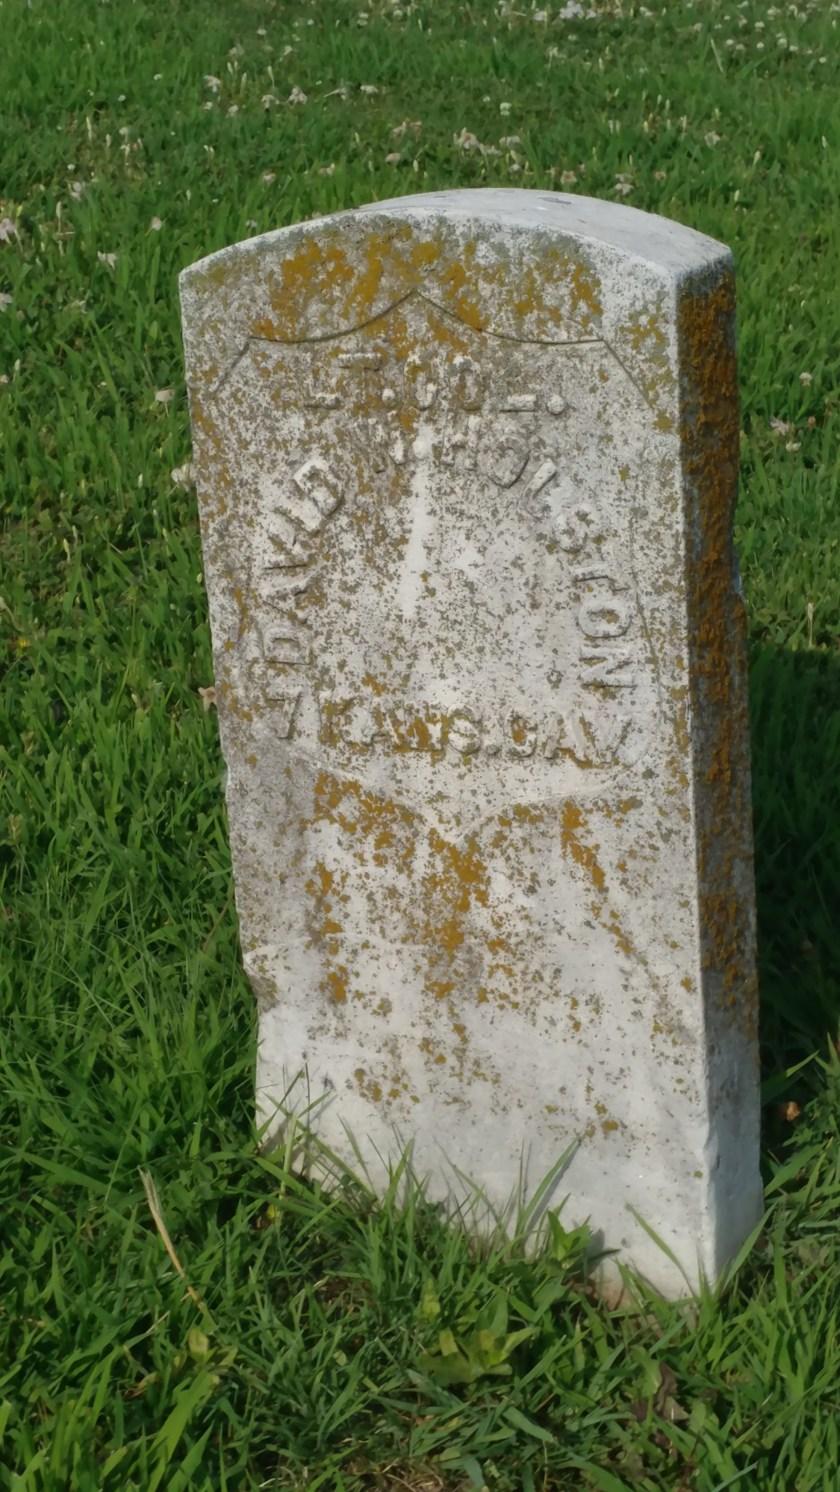 D. W. Houston